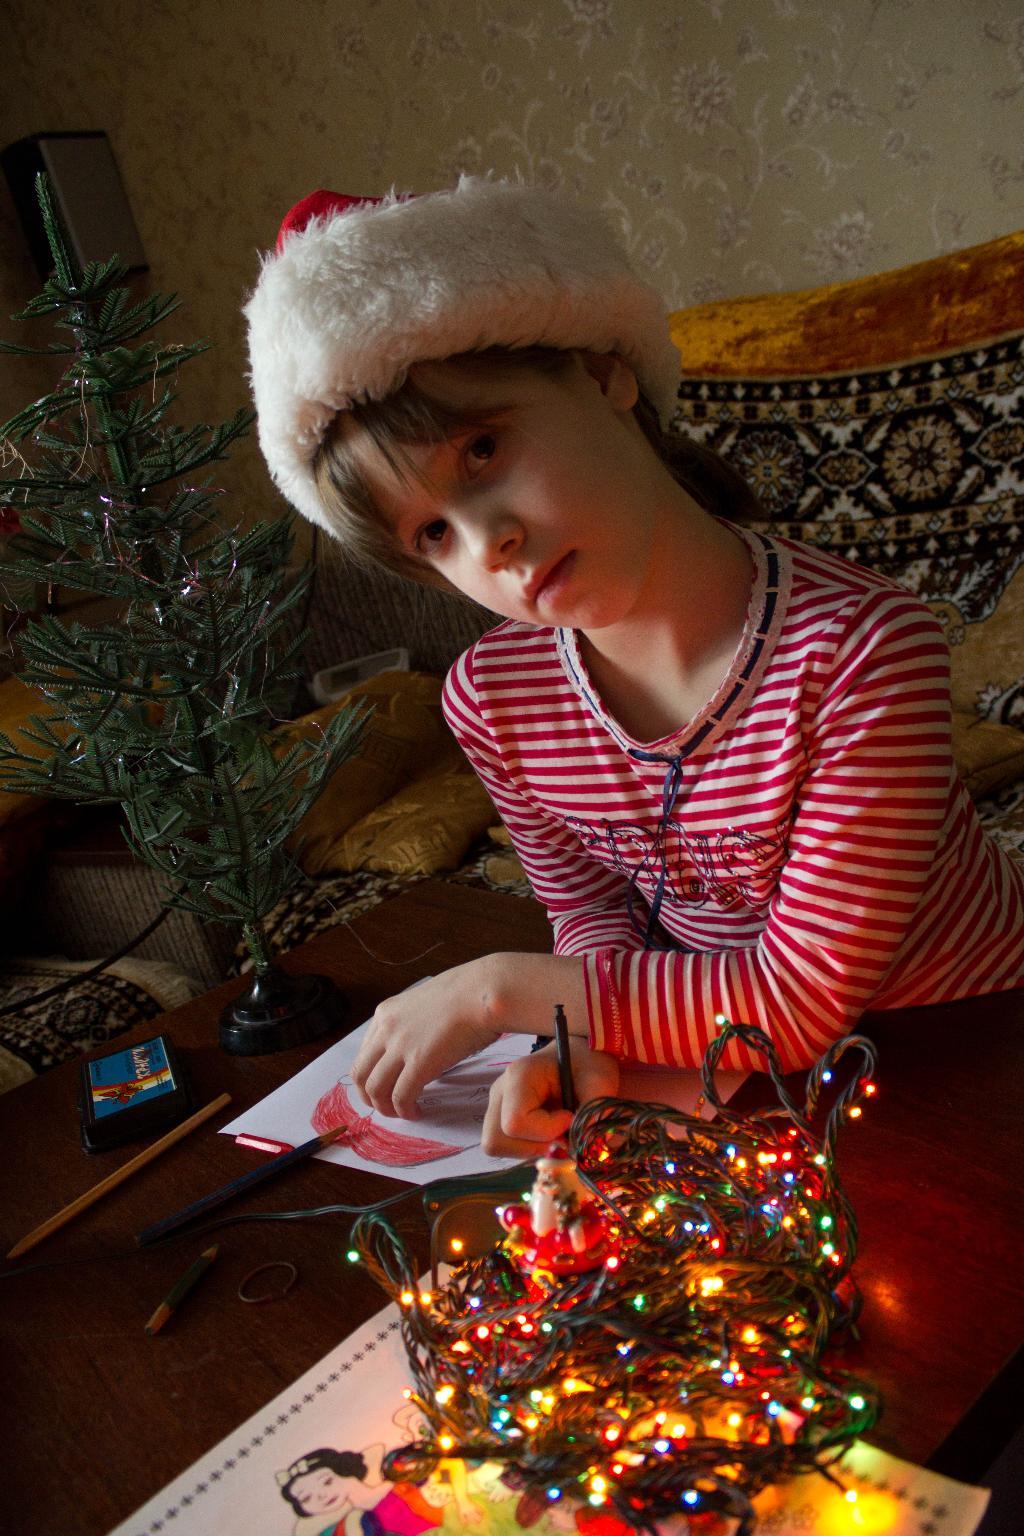 Здравствуй Дедушка Мороз.... Пишу письмо Деду Морозу